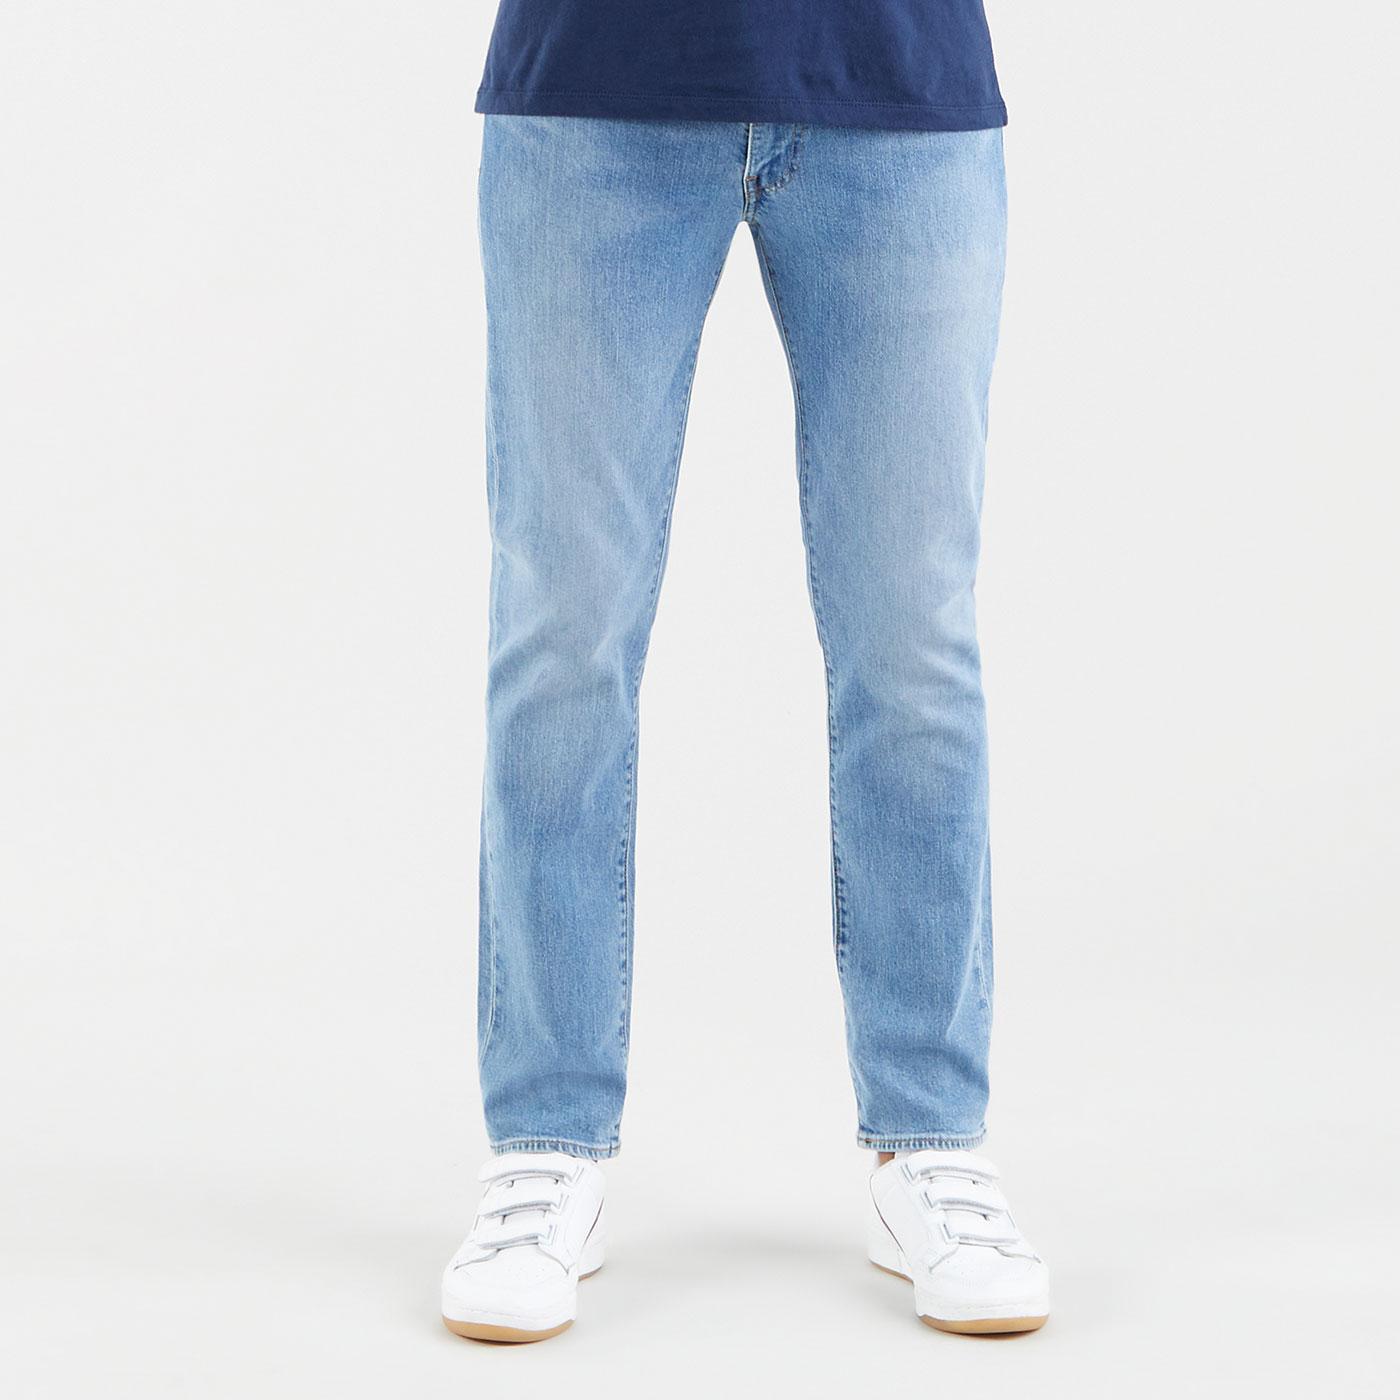 LEVI'S 511 Slim Retro Jeans (Corfu Got Friends)